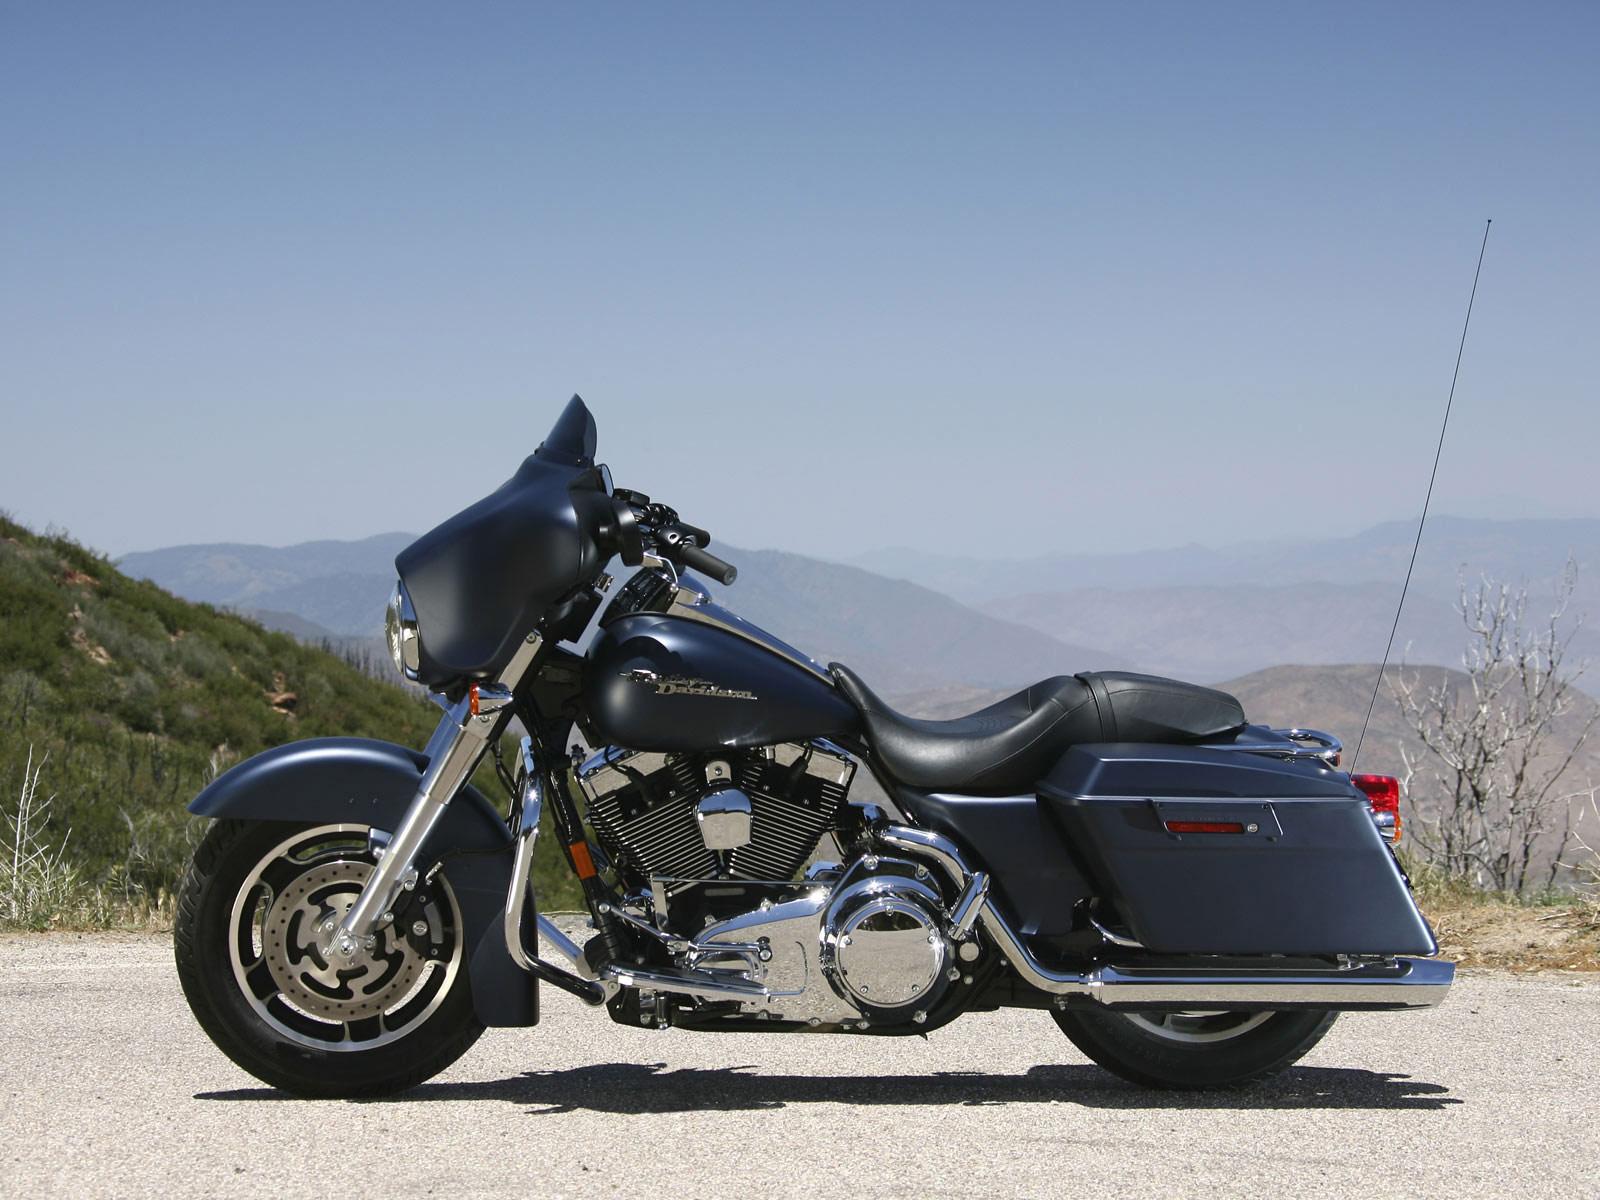 Harley Davidson 2008: 2008 Harley-Davidson FLHX Street Glide Pictures